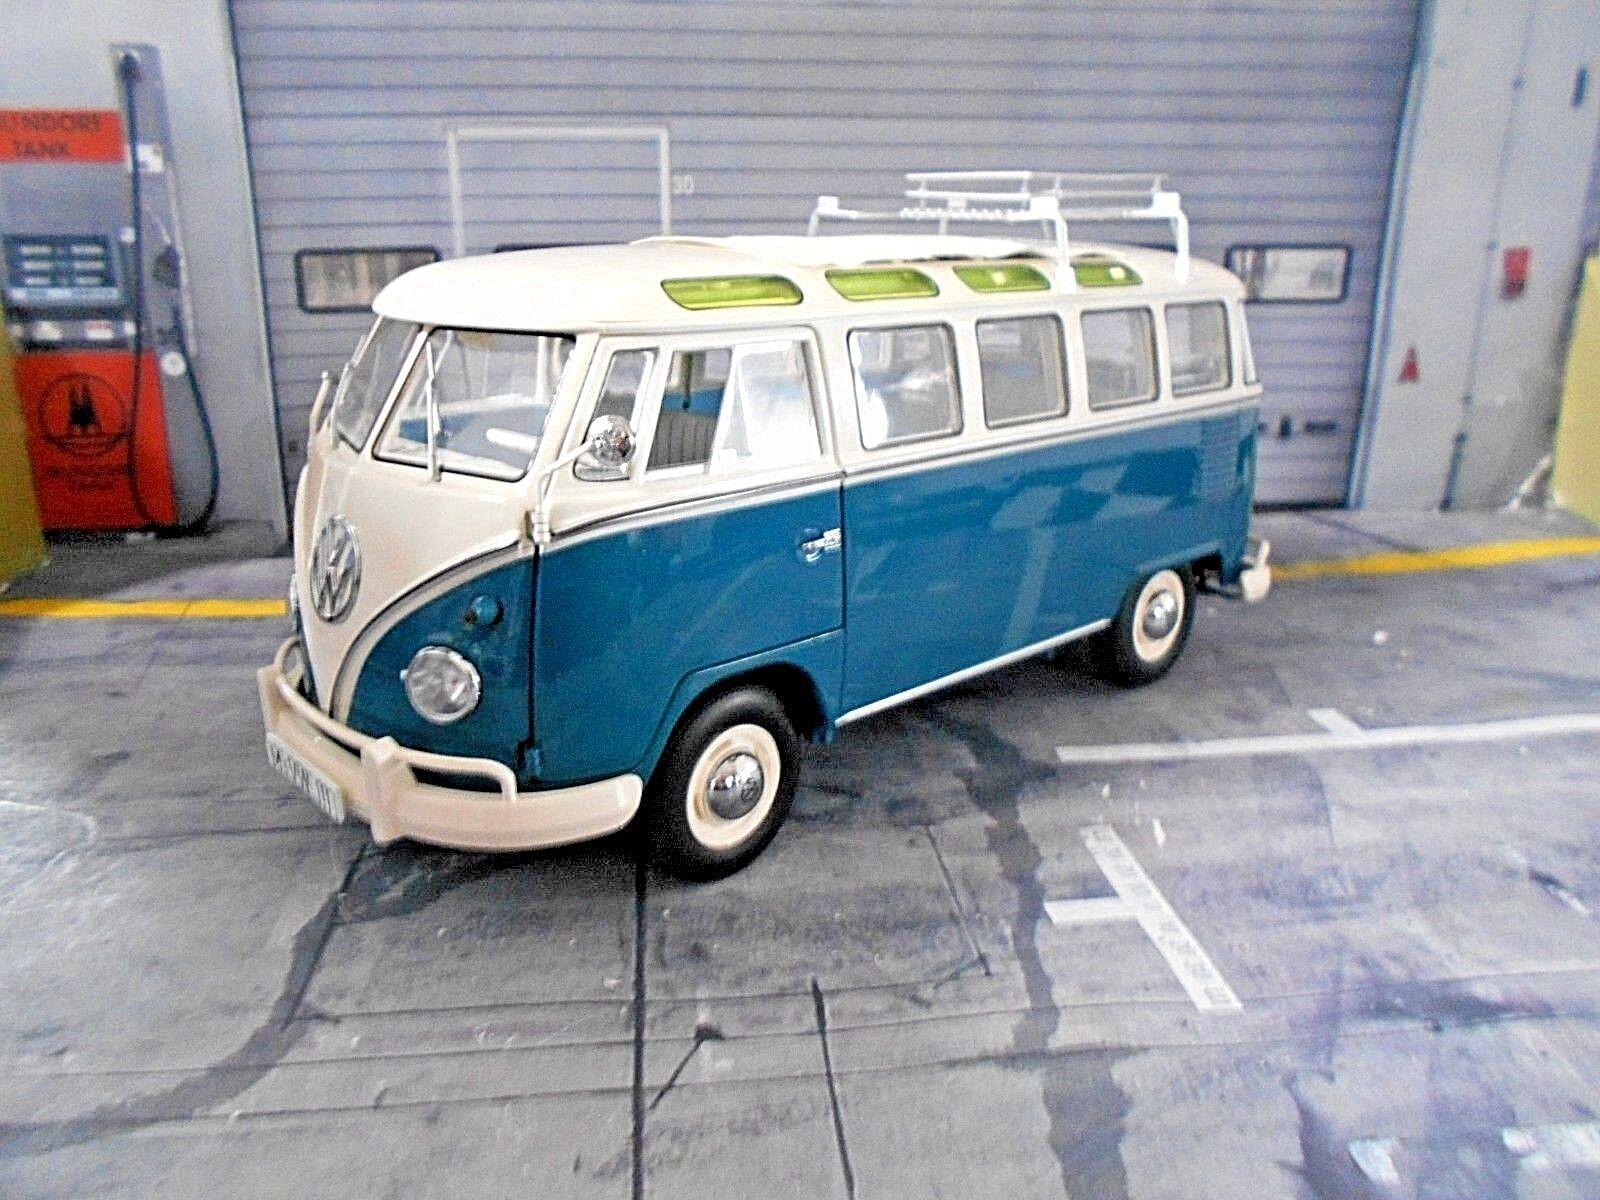 VW VOLKSWAGEN t1b t1 bus bus bus fensterbus Inverno Sport Invernali Blu Schuco Limited 1 18 91a59f